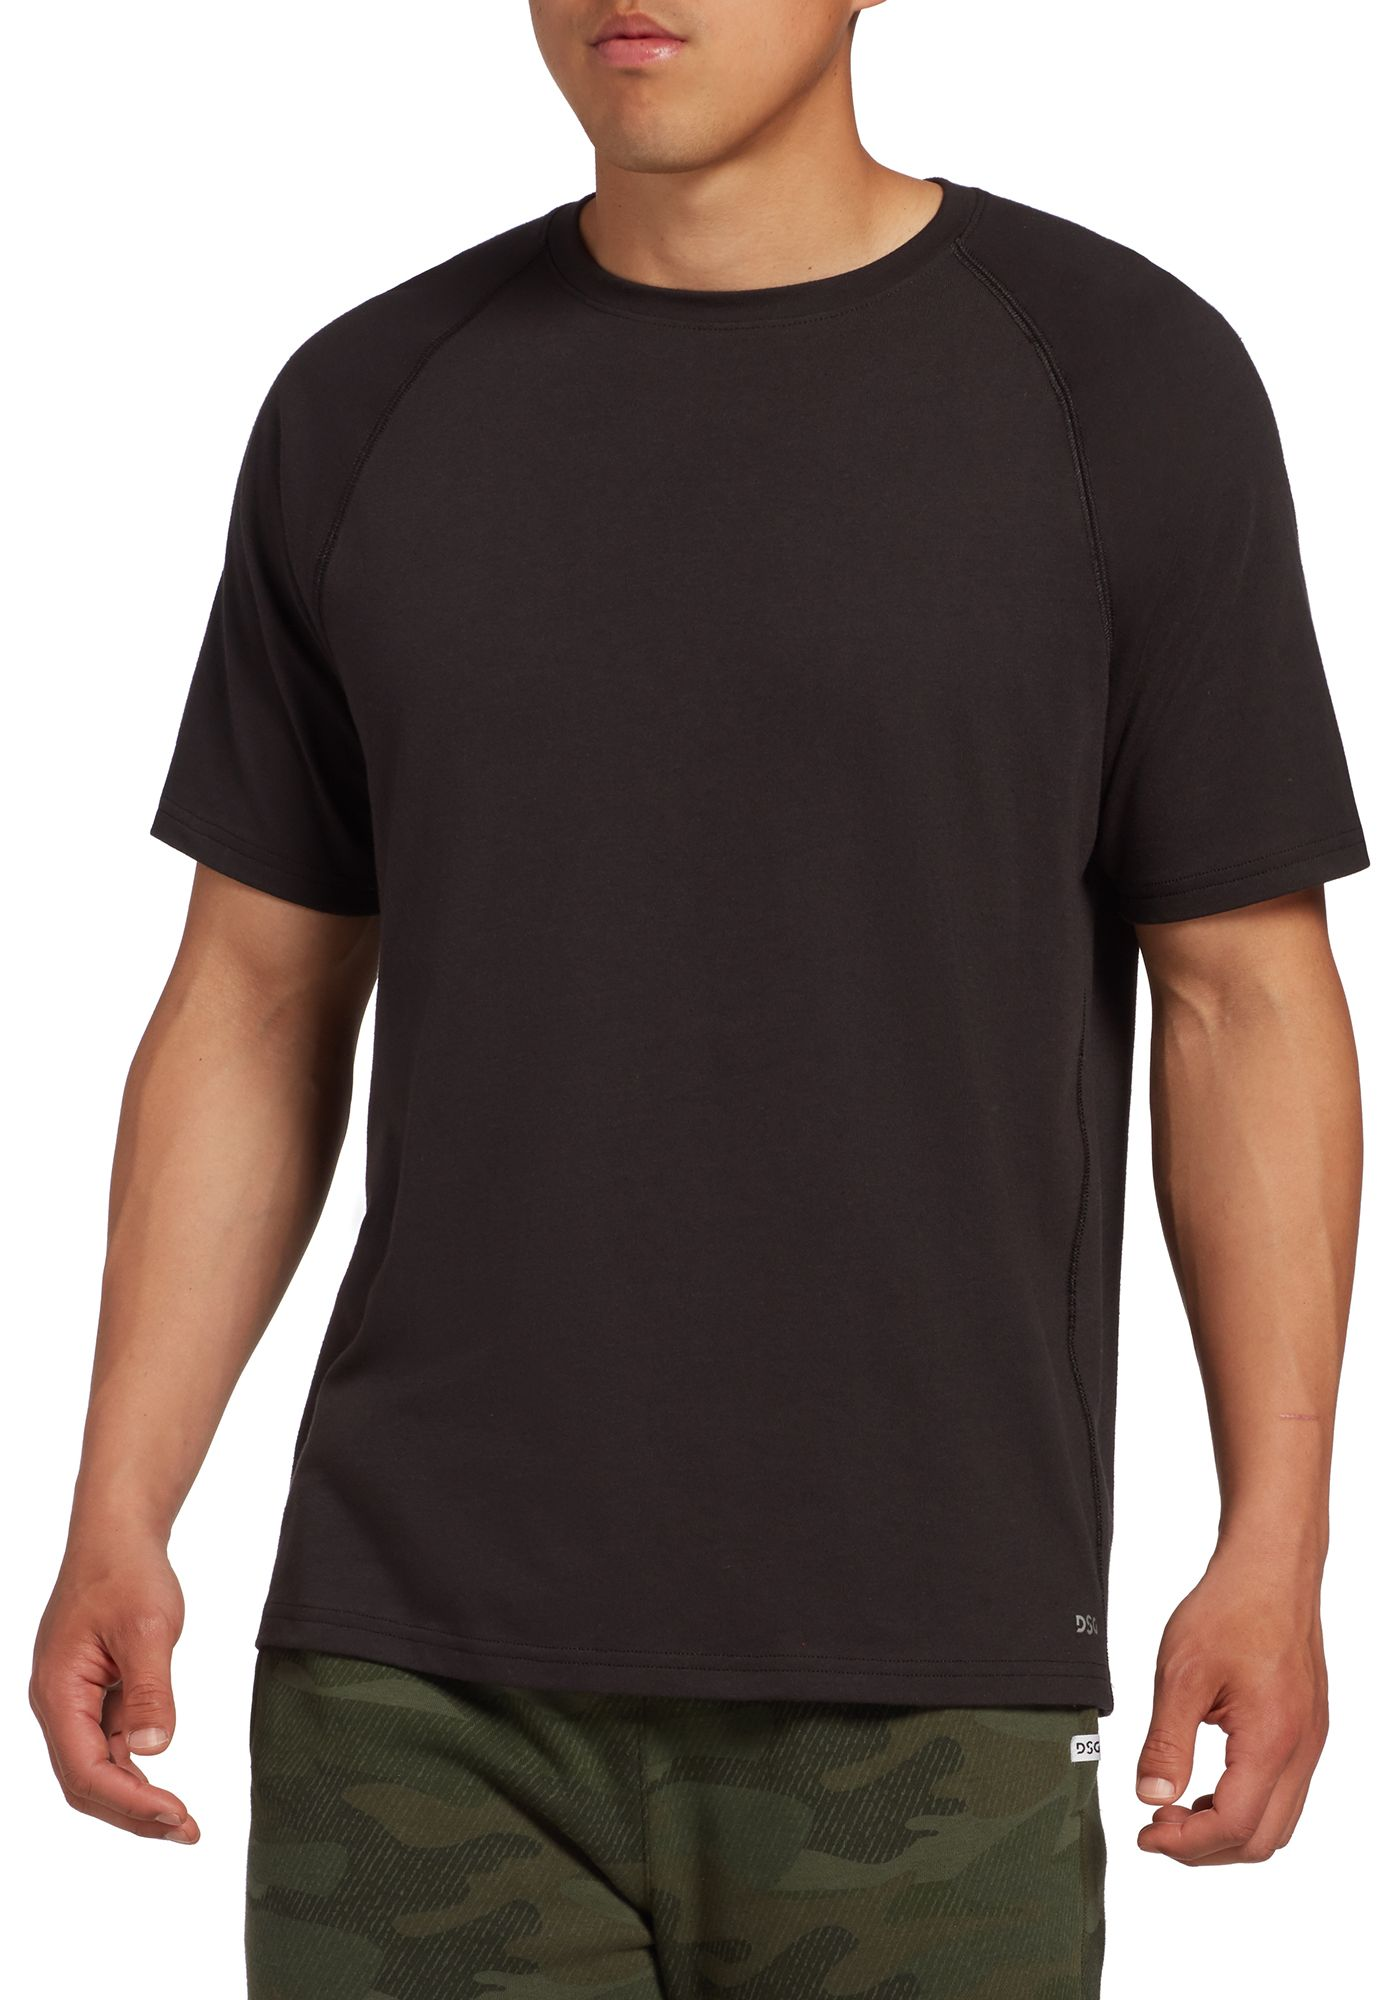 DSG Men's Cotton Training T-Shirt